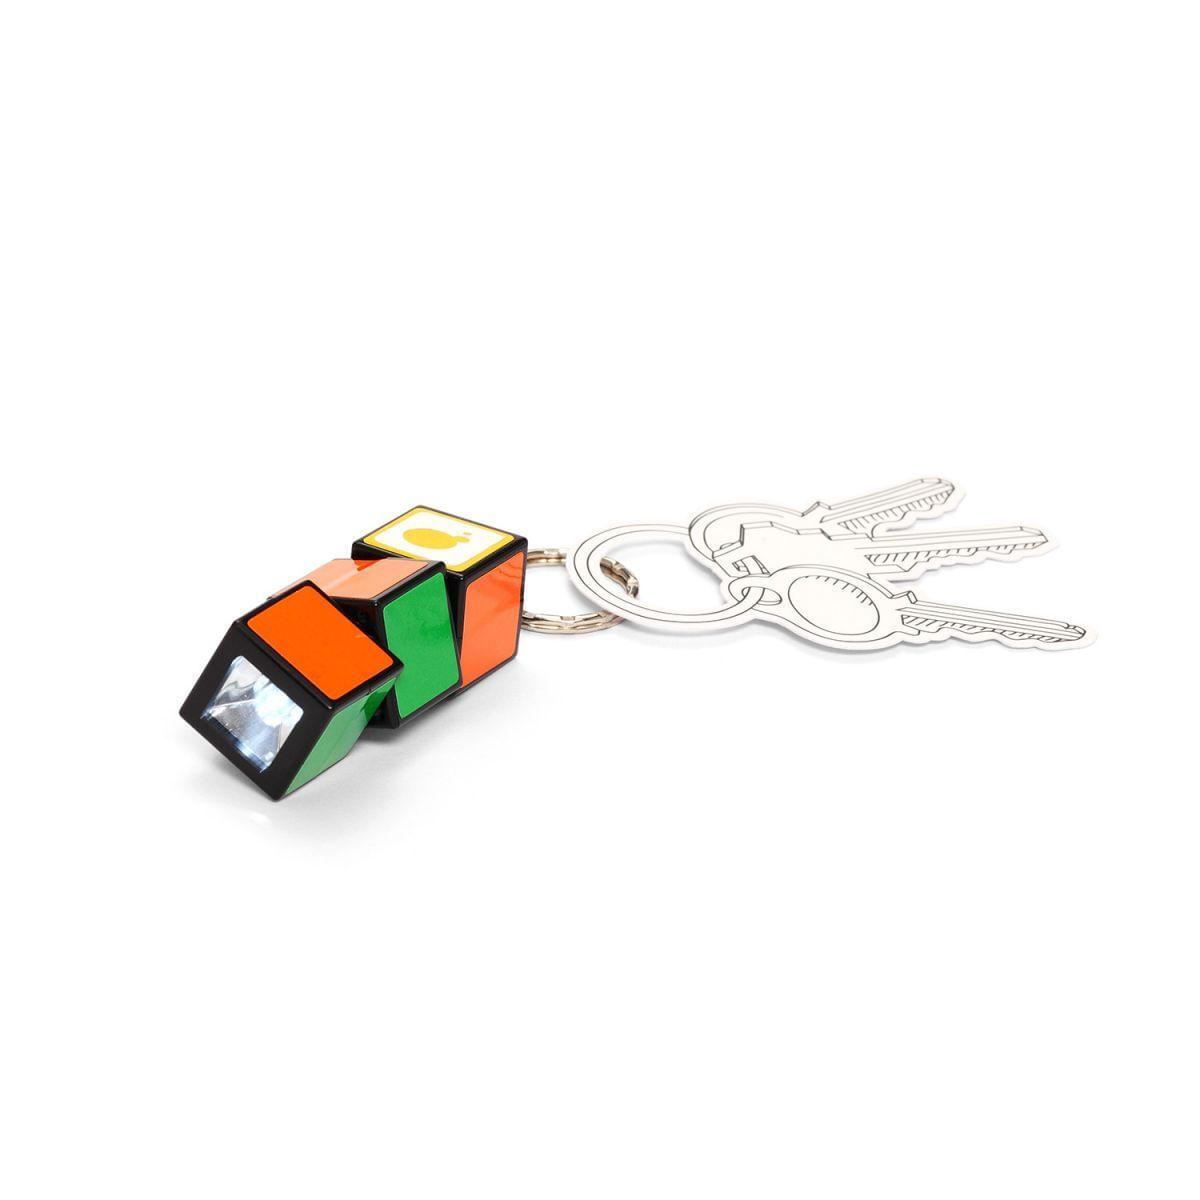 638bfc880a7ab Chaveiro lanterna cubo colorido - Imaginarium